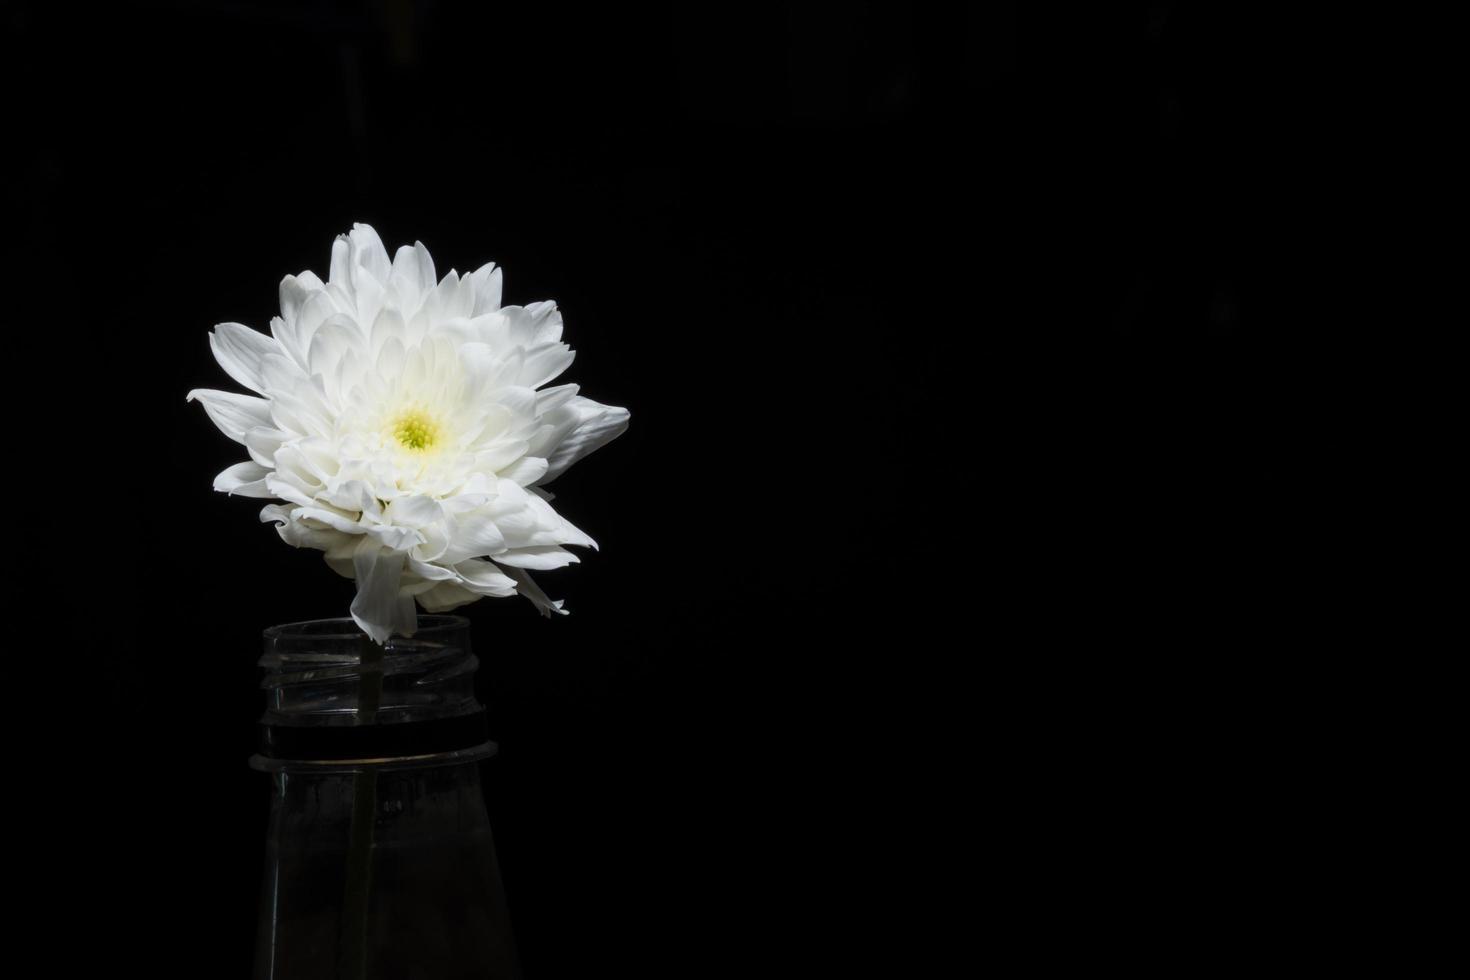 krysantemum vit blomma på svart bakgrund foto